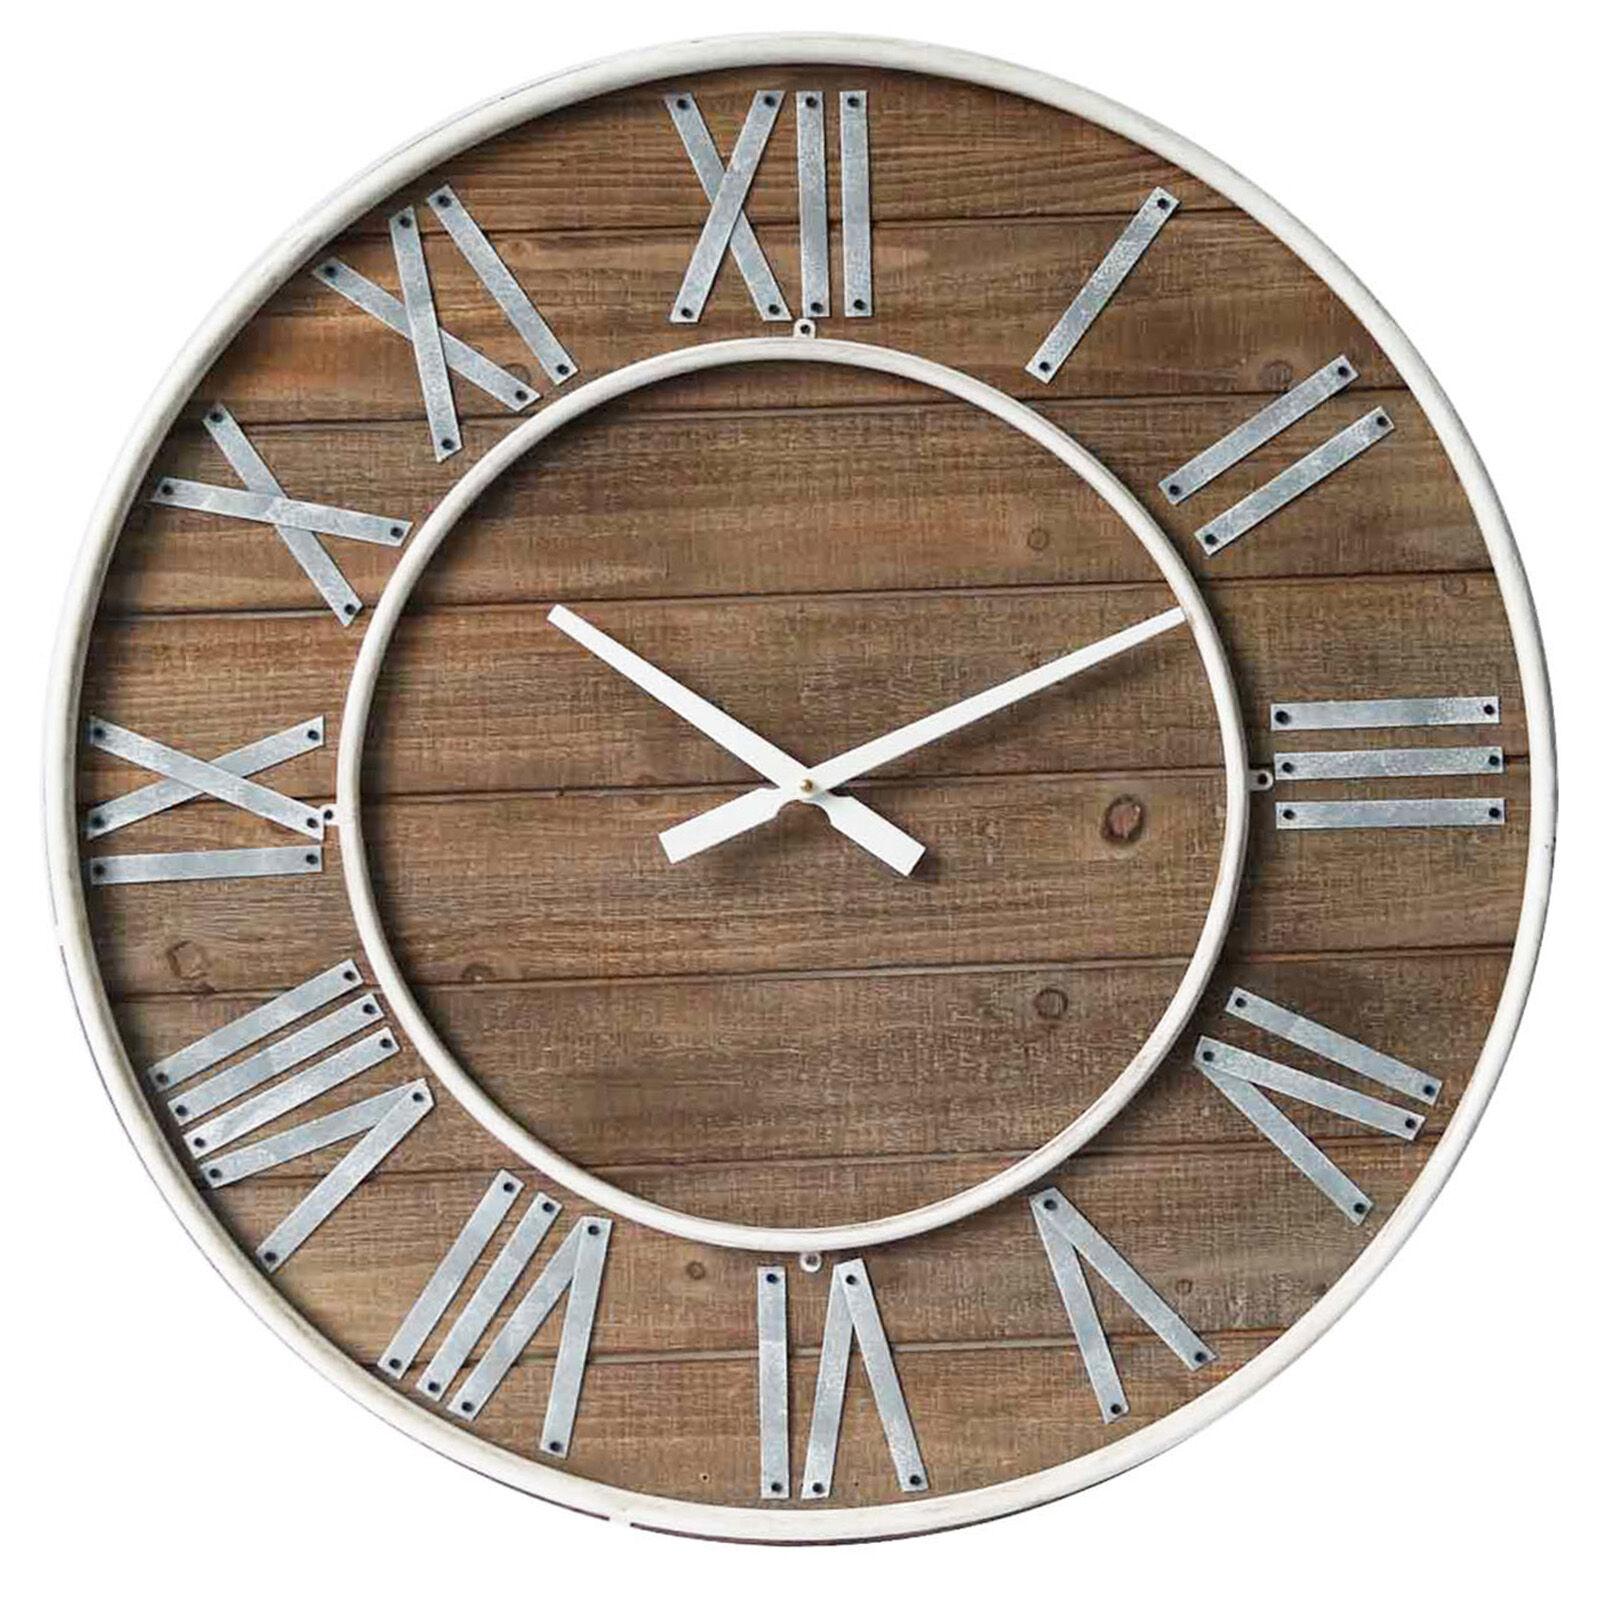 Startling Galvenized Roman Wood Clock Galvenized Roman At Home Roman Numerals Clocks Year 3 Roman Numerals Clock Tattoo Wood Clock houzz-03 Roman Numerals Clock